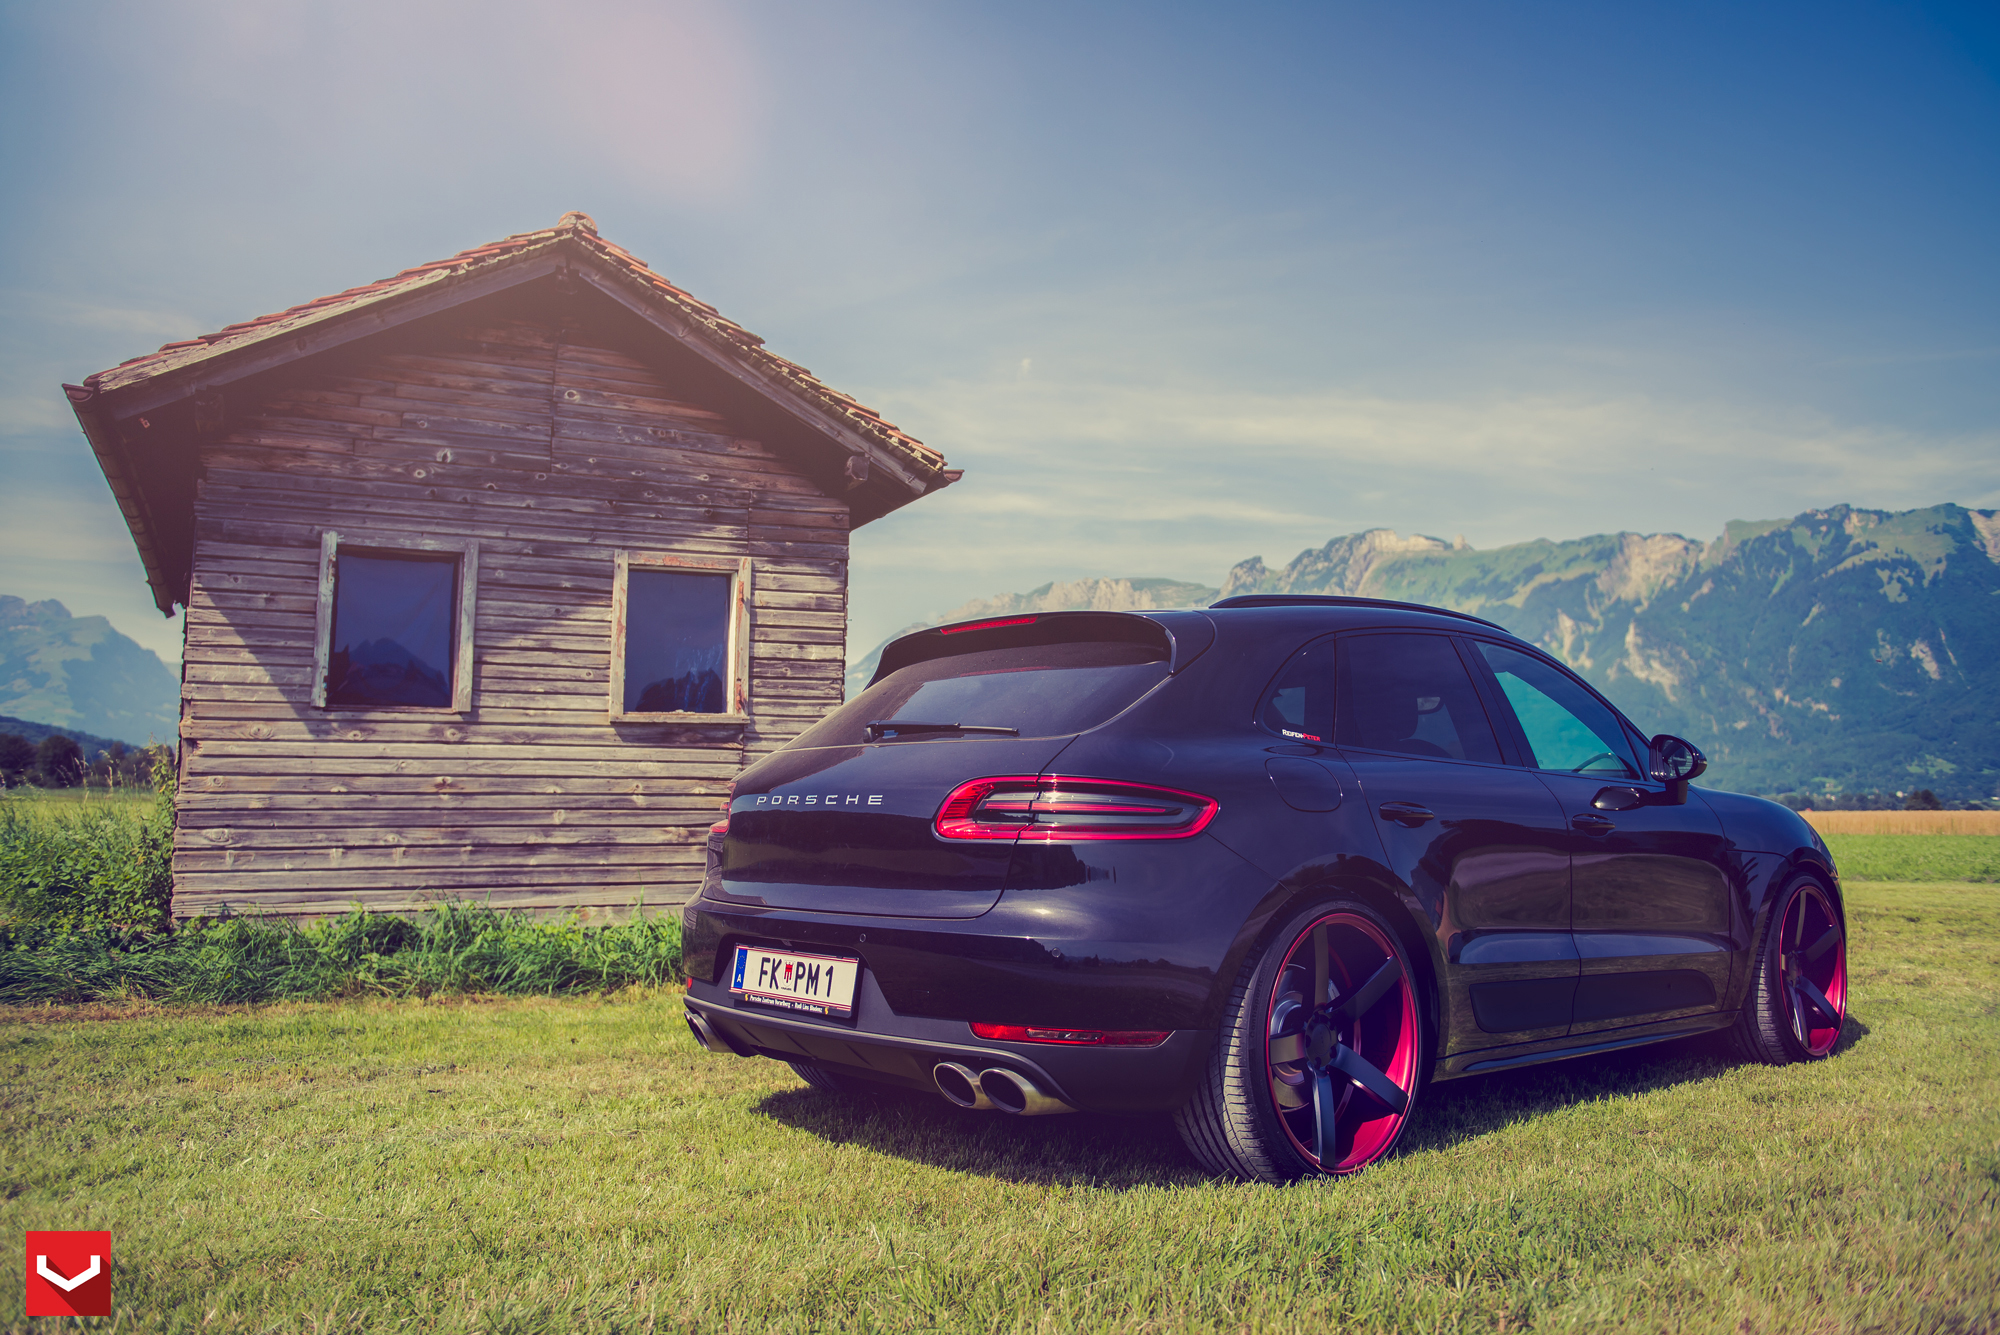 Tuner Car Wallpaper Hd Porsche Macan Stanced On Custom Vossen Wheels Autoevolution